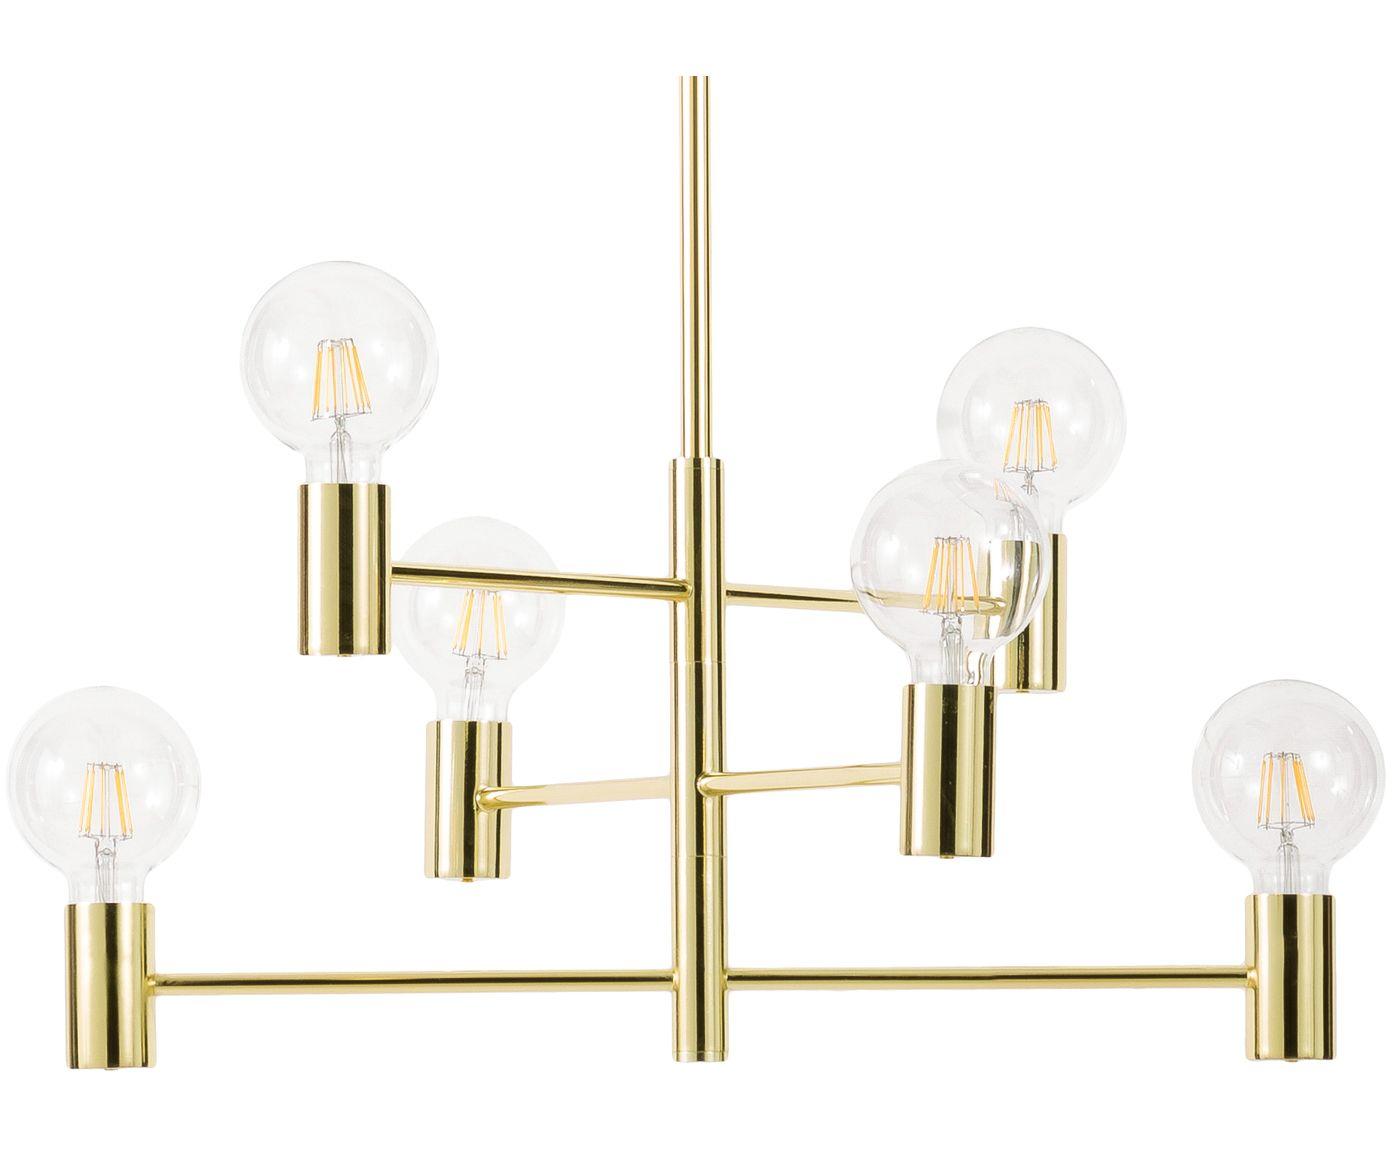 Lampa Wiszaca Capital Pendelleuchte Hangeleuchte Leuchten